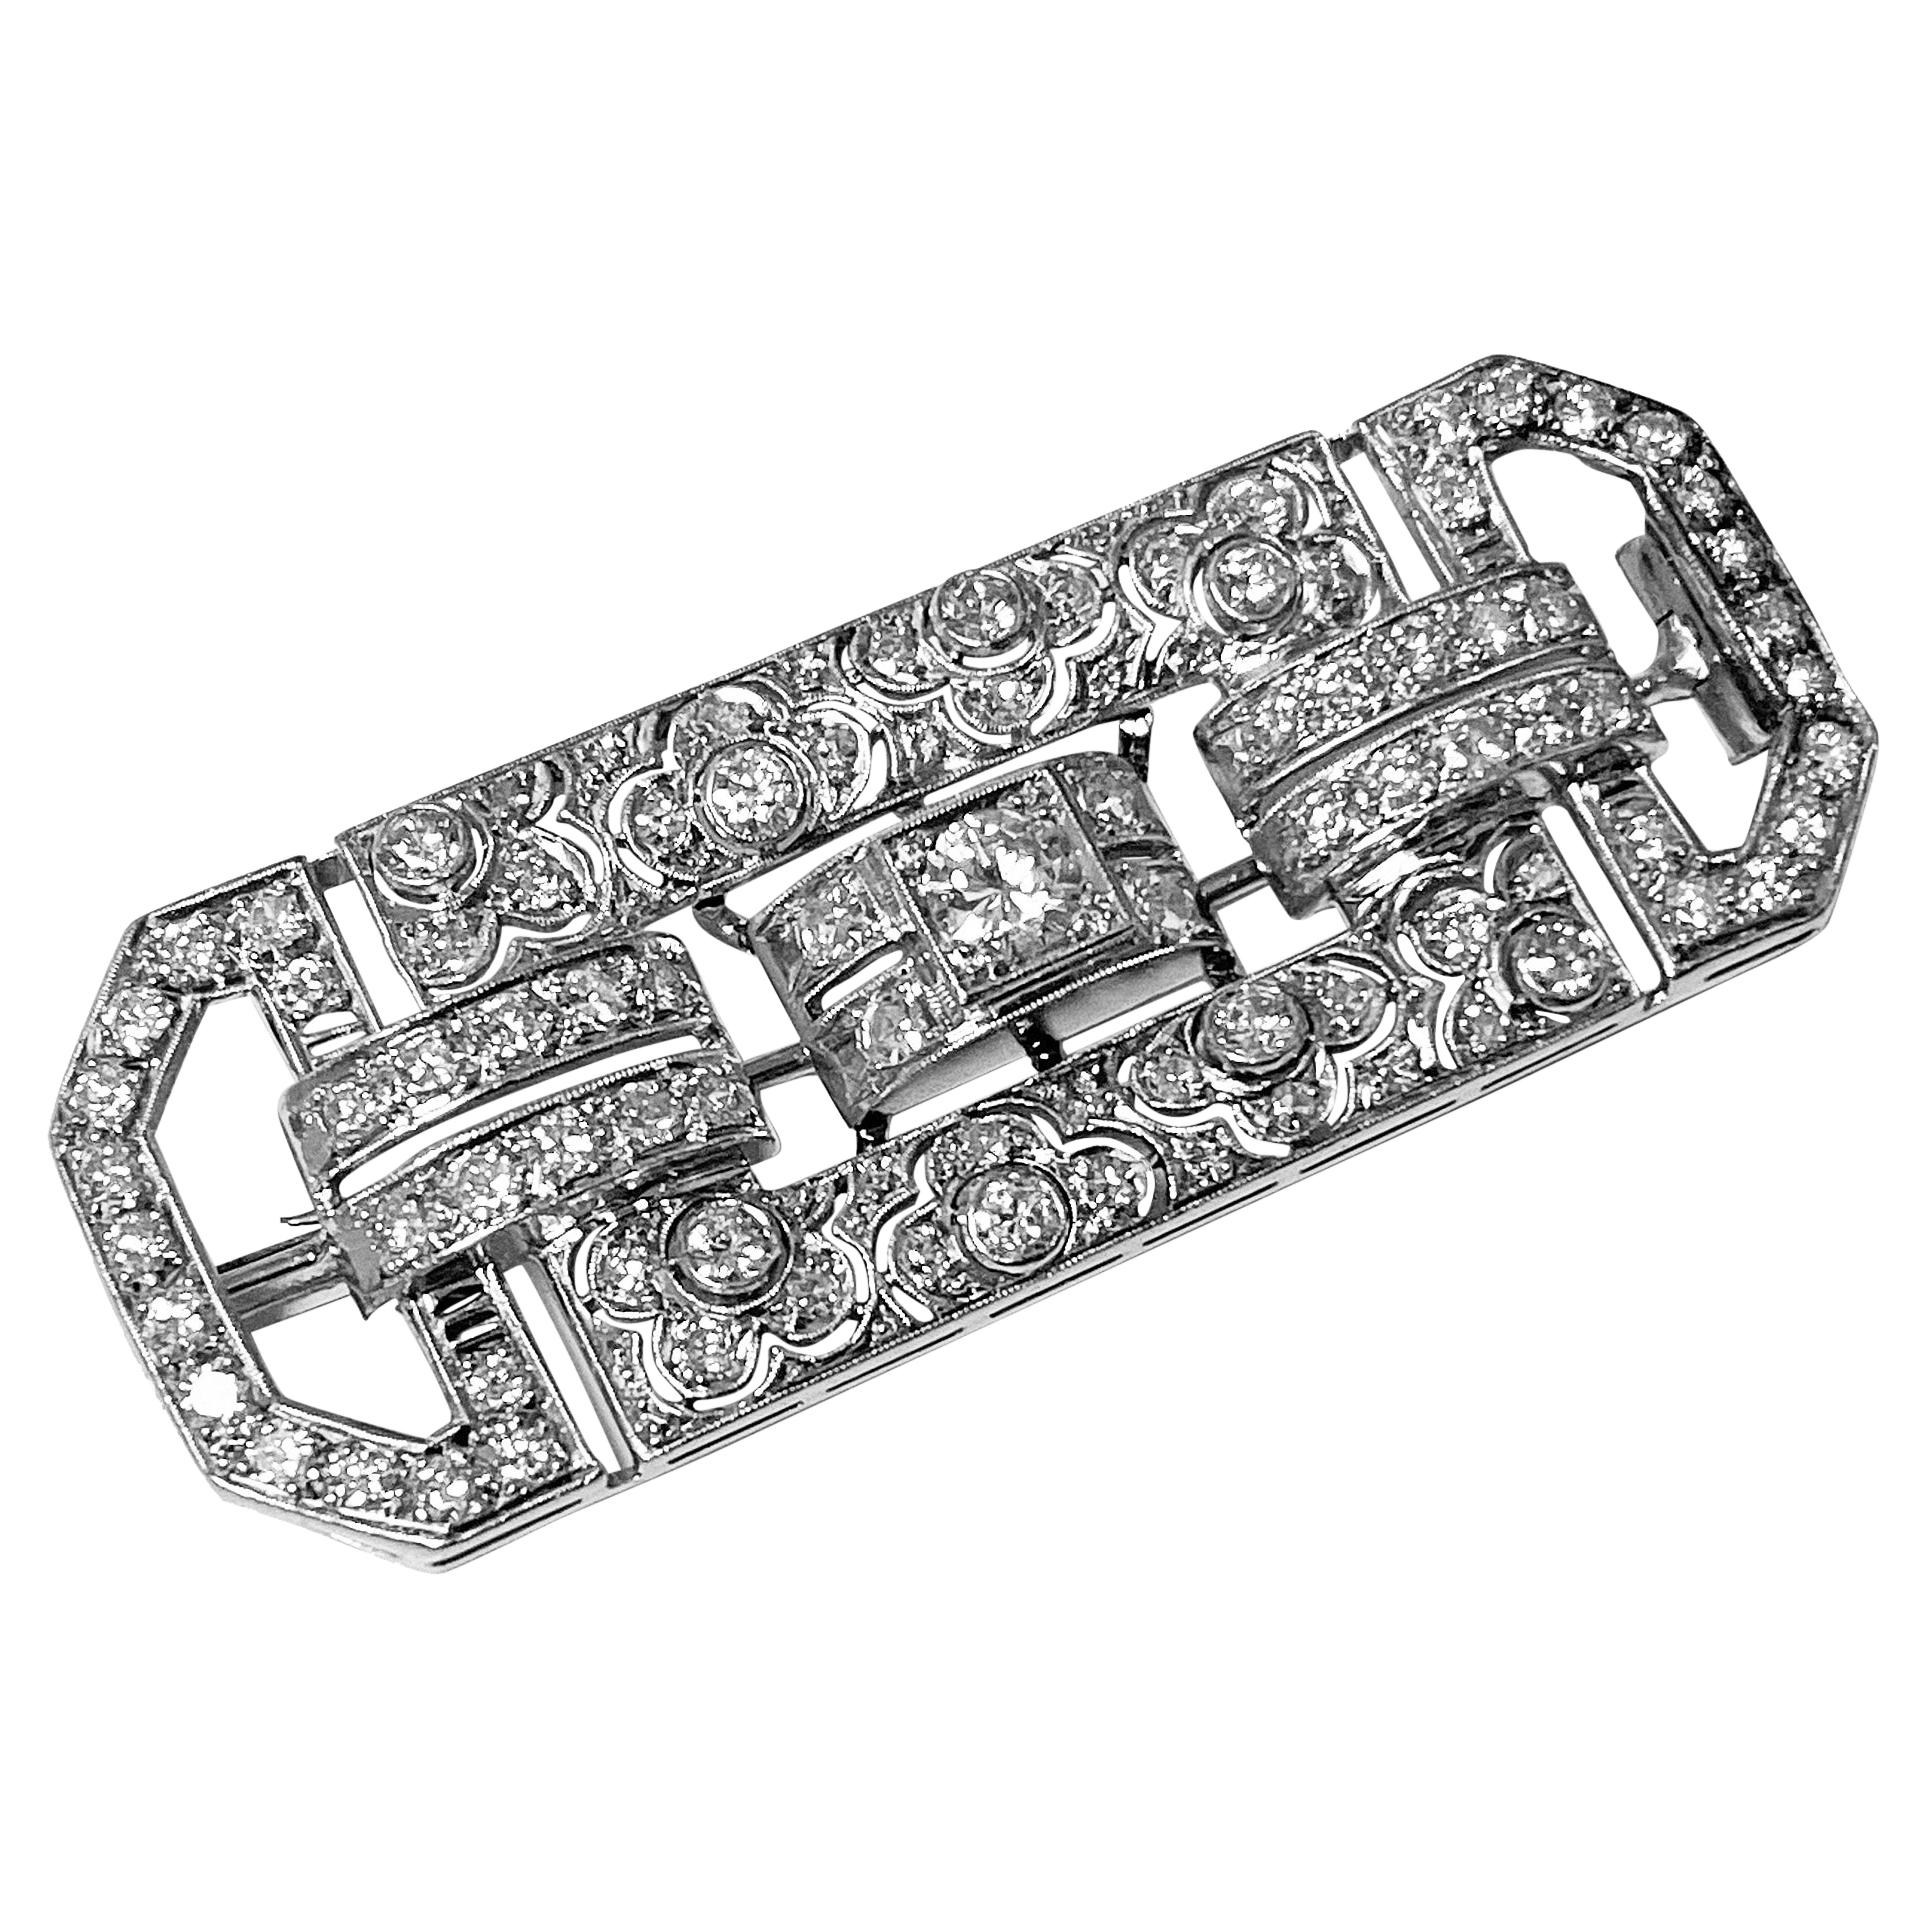 Art Deco Diamond and Platinum Brooch, C.1925